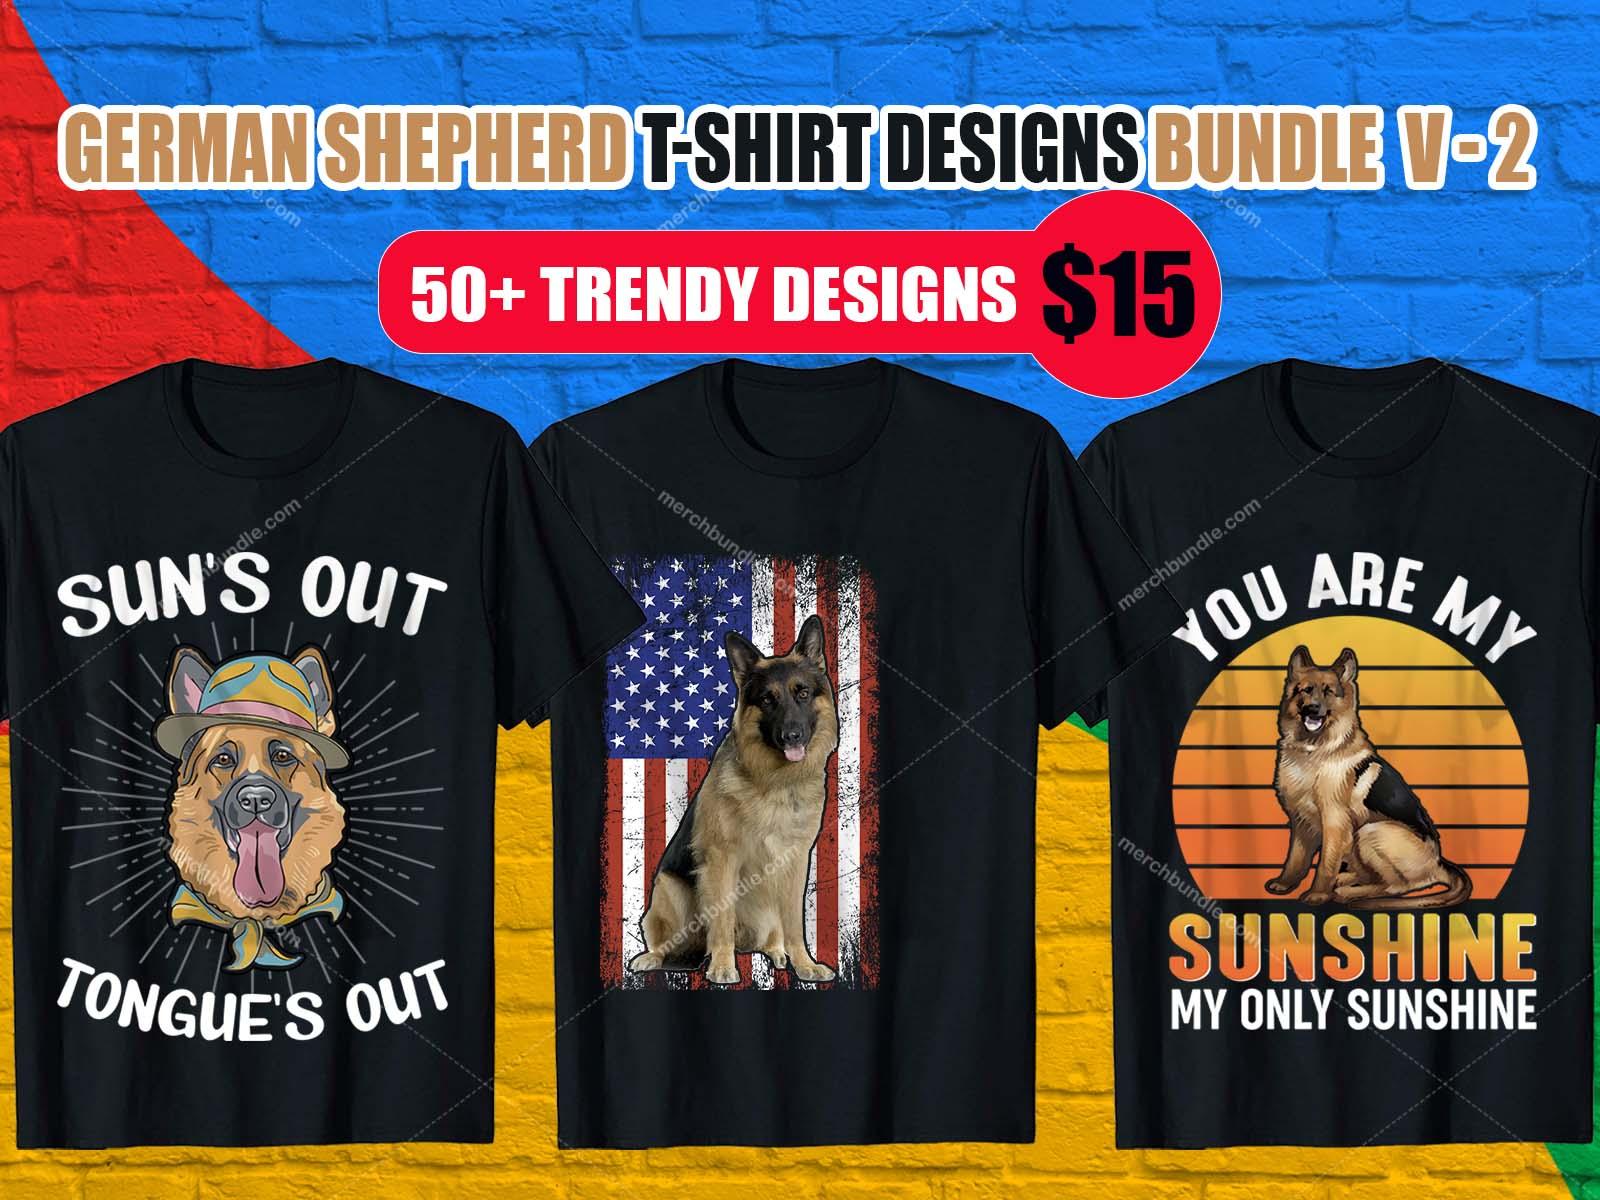 German Shepherd T Shirt Designs